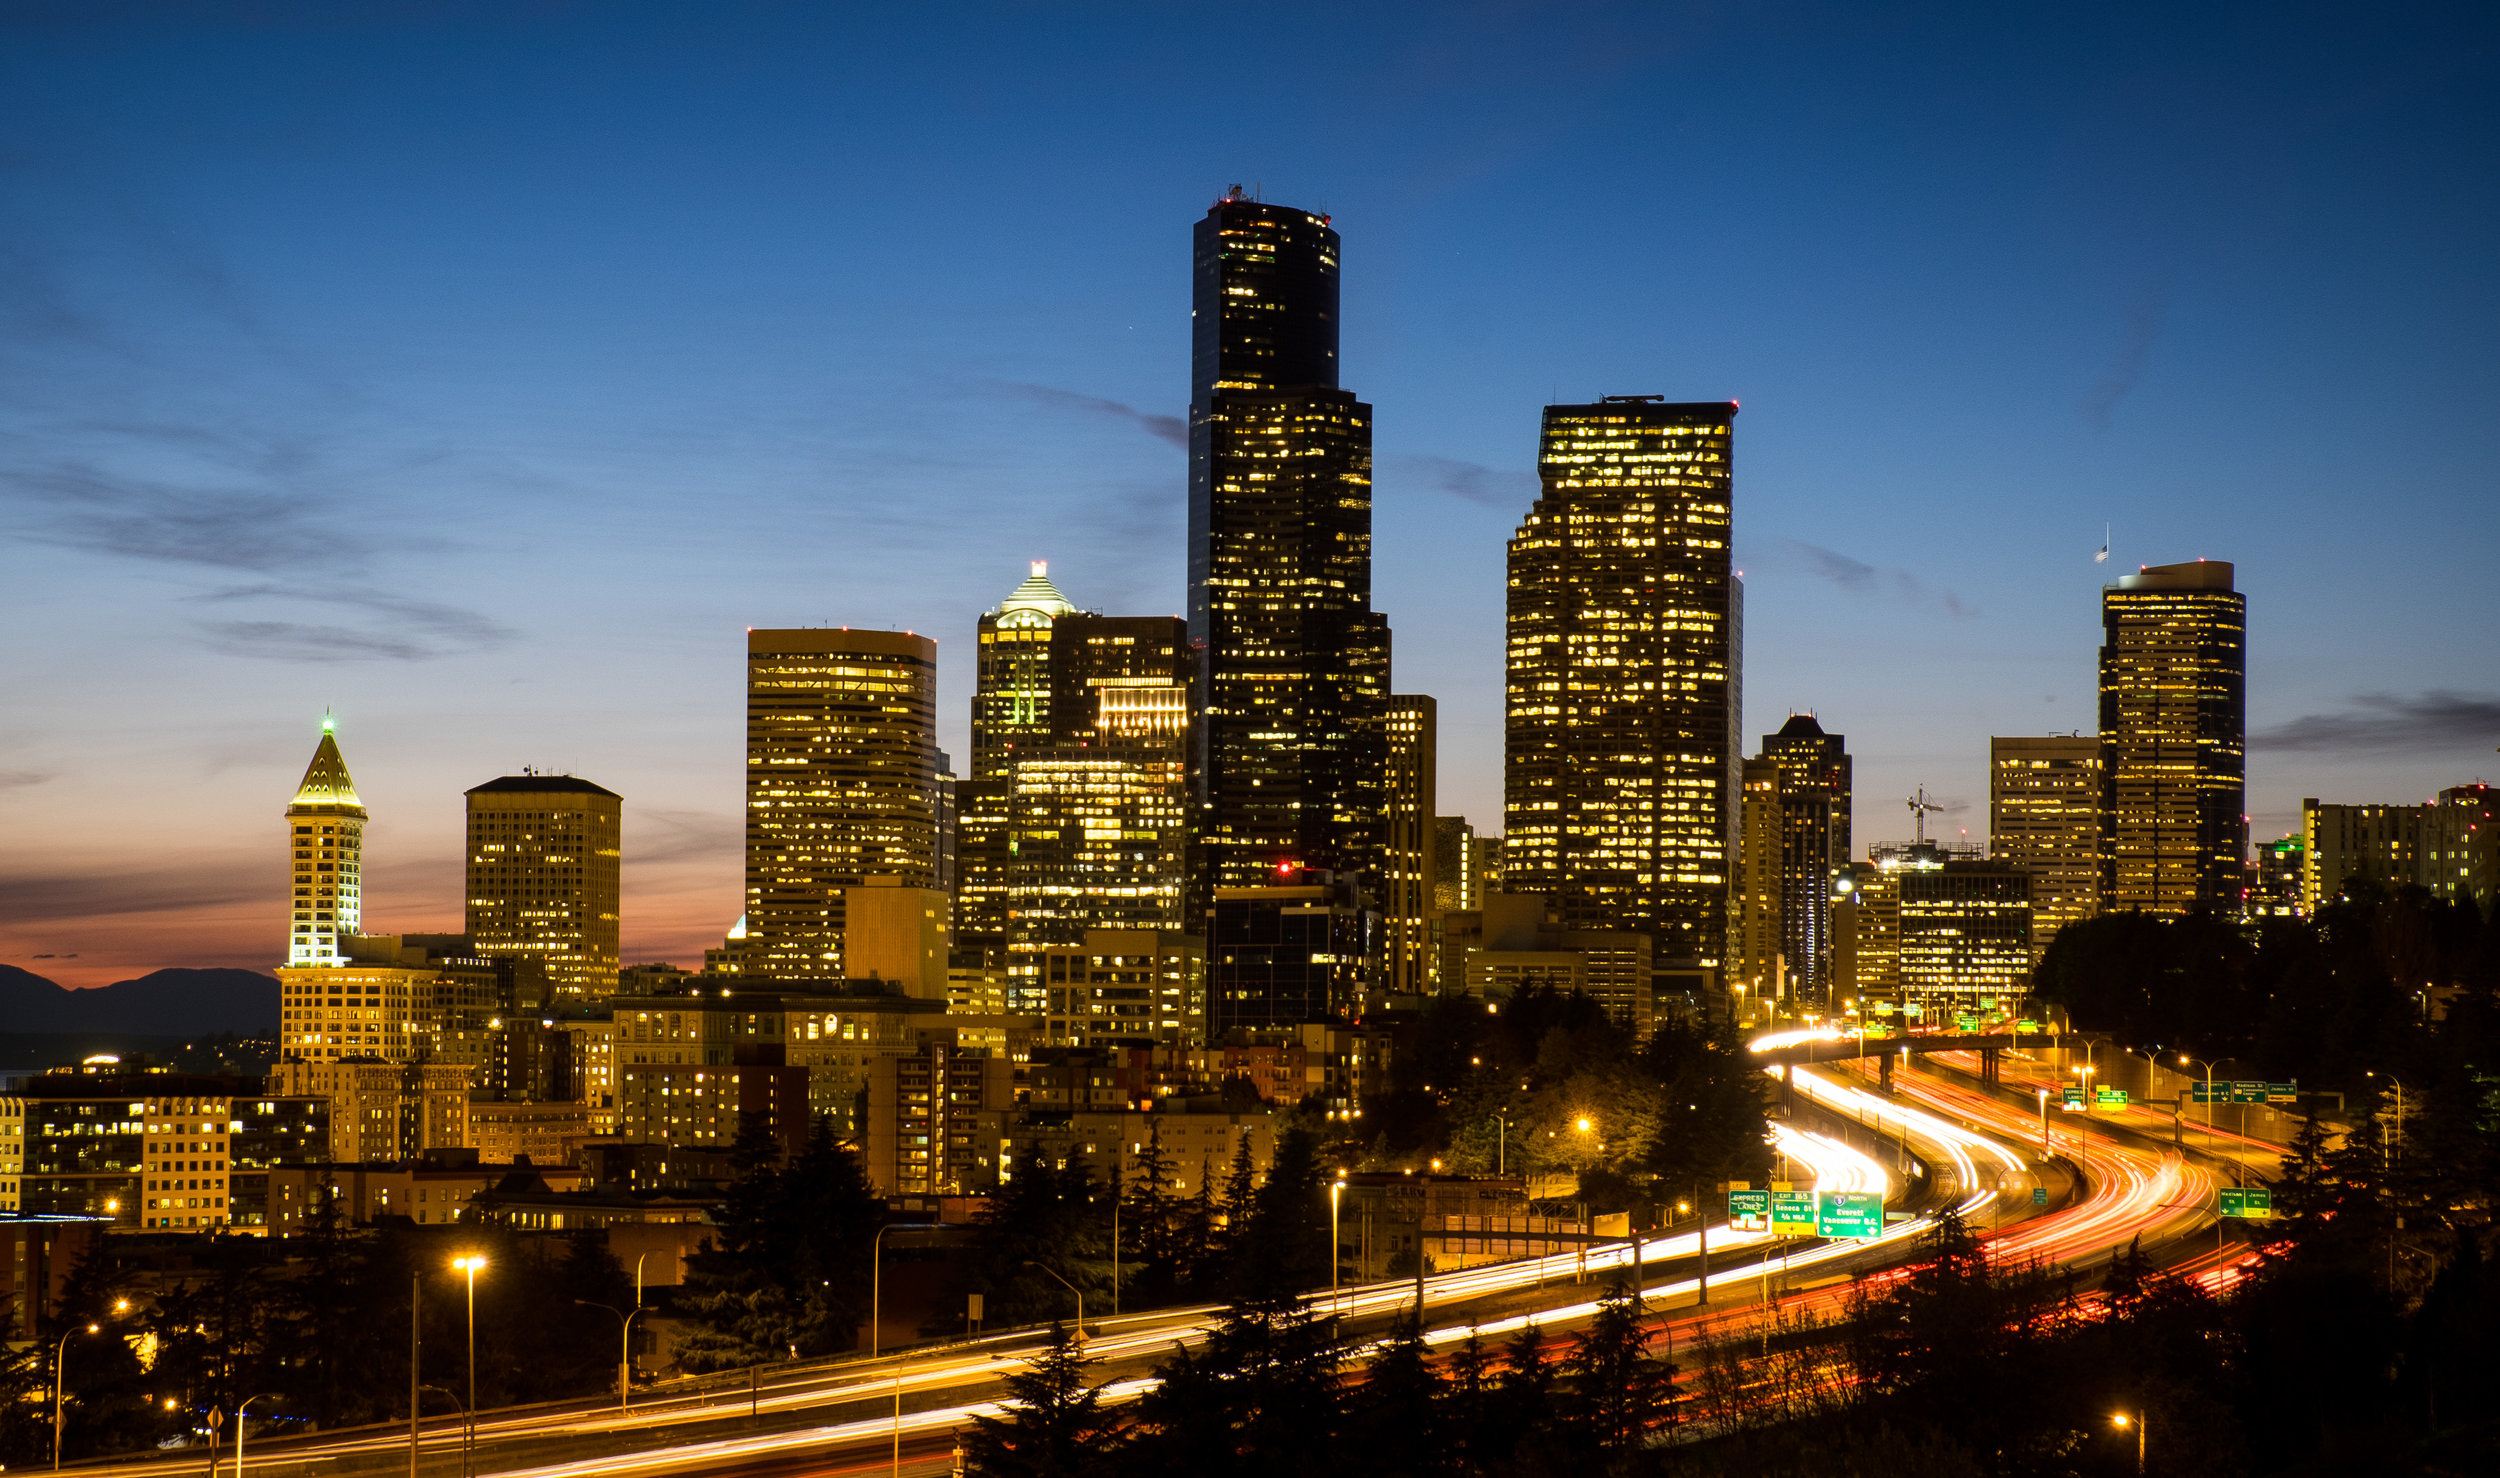 Seattle Skyline, Dr. Jose Rizal Bridge  Camera: Fujifilm X-T1 Shutter speed: 8 seconds Aperture: f/10 ISO: 200 Photo: Jeff Carlson